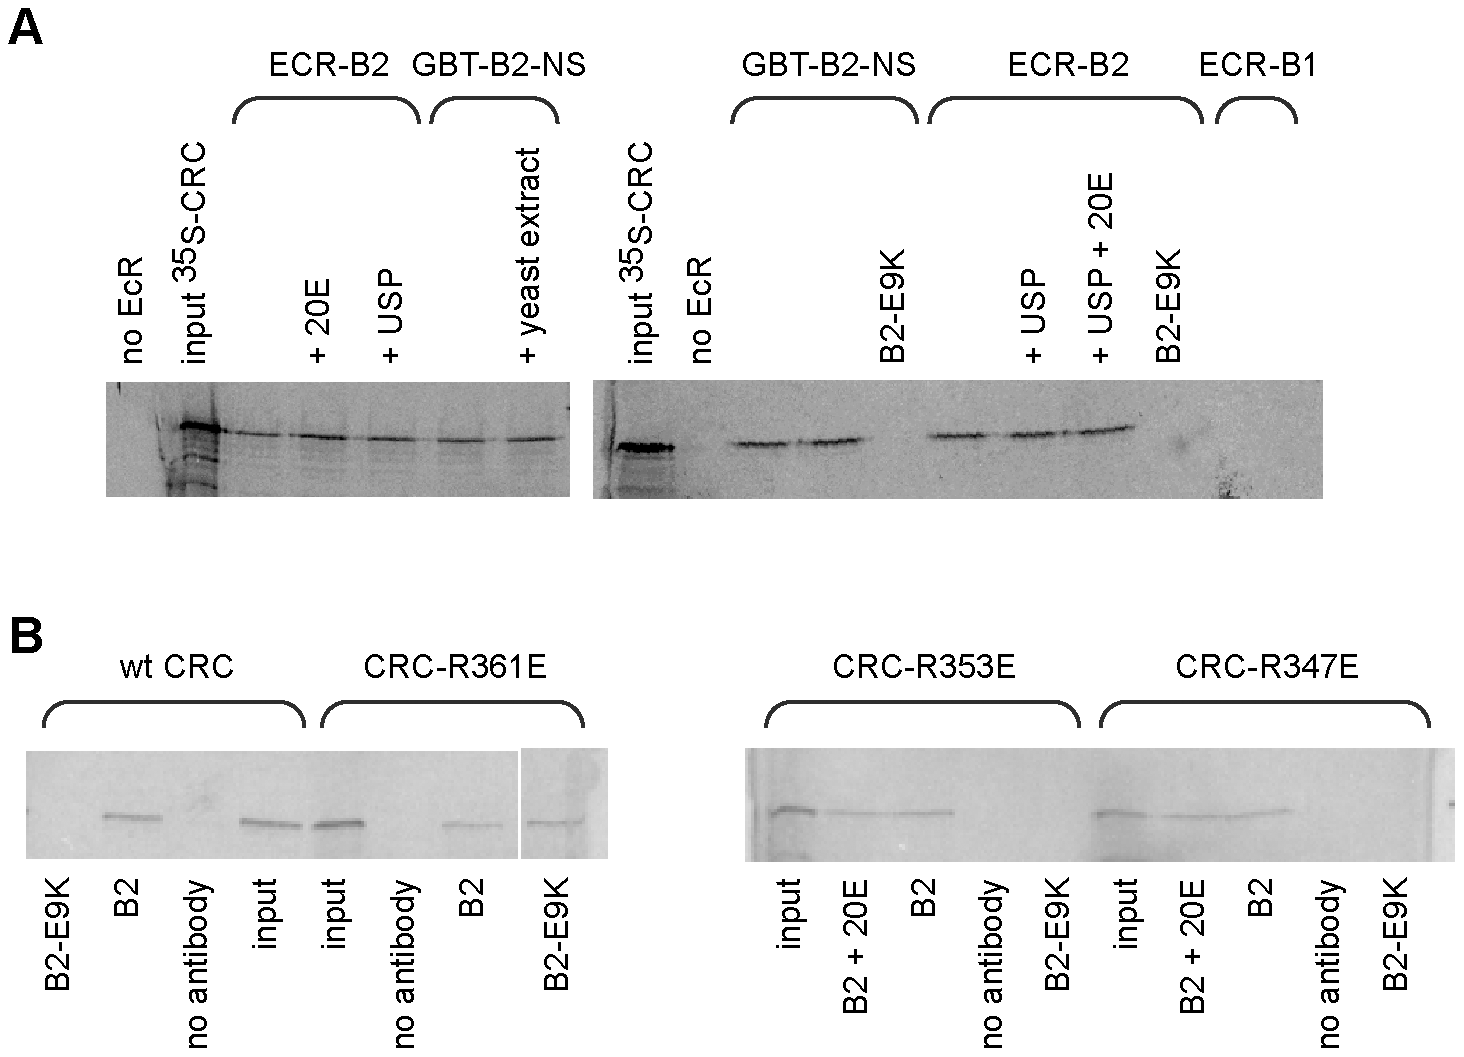 Binding of CRC to EcR-B2 <i>in vitro</i>.